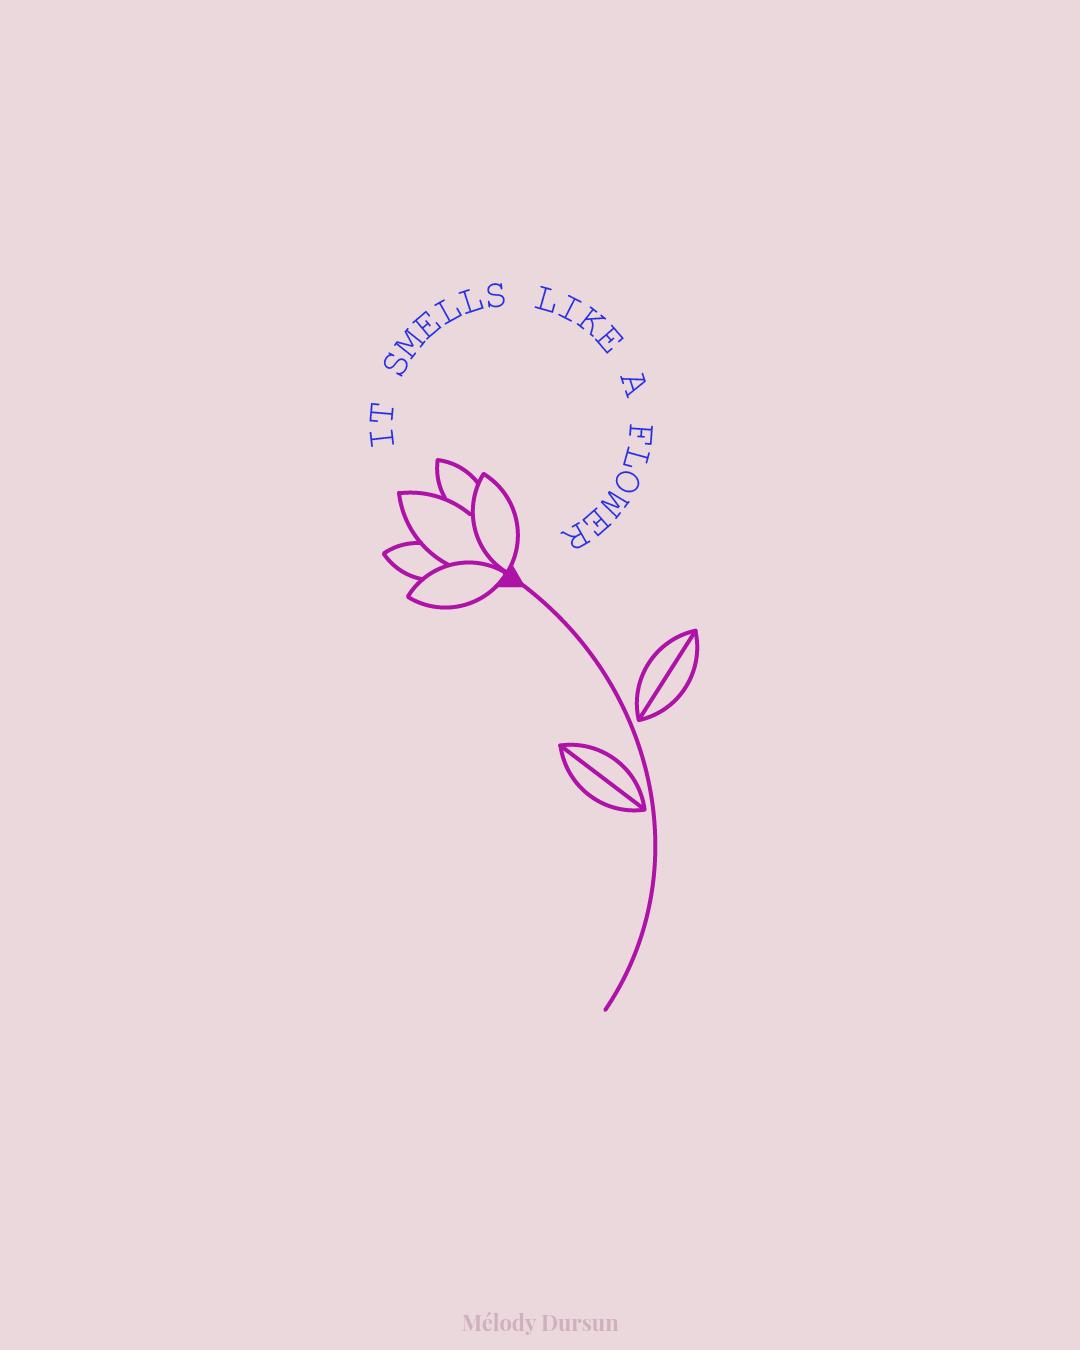 melodydursun-like-a-flower